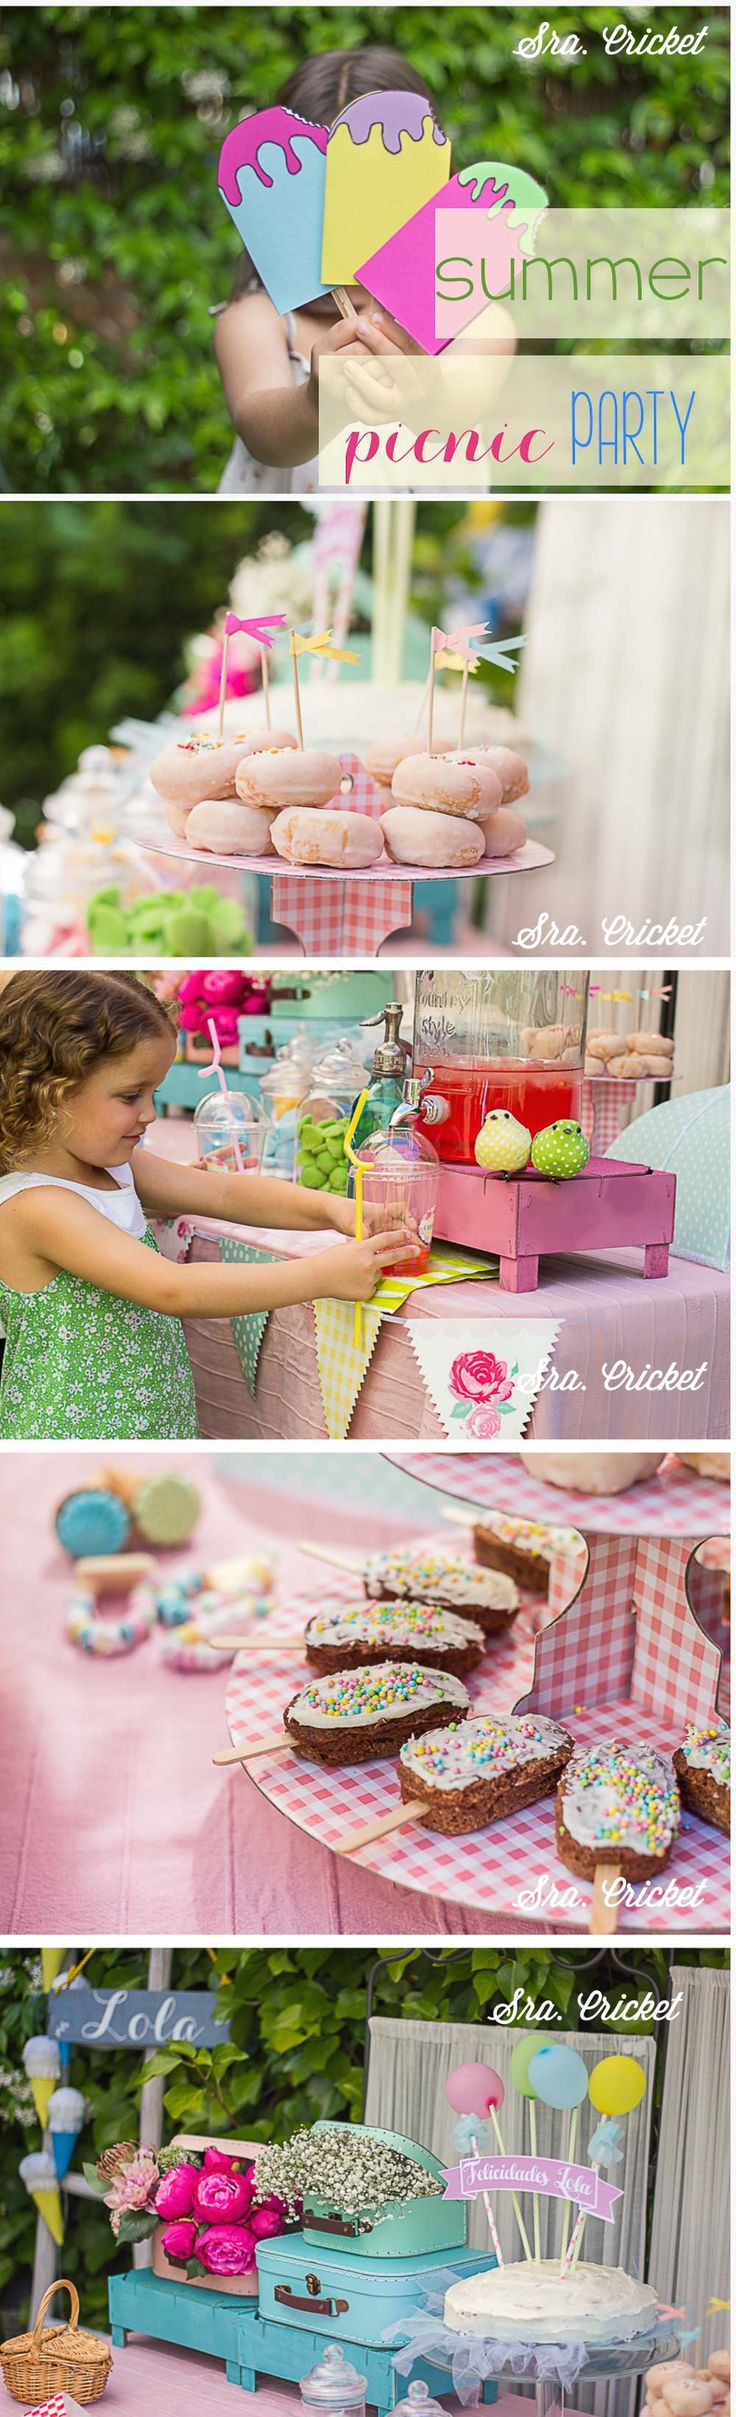 Fiesta infantil de verano Summer picnic party #kidsparty #fiestasinfantiles #summerparty #icecreamparty ICE CREAM PARTY #fiestadehelado Table Decorations, Party, Summer, Ice Cream, Food, Ice Cream Party, Candy Stations, Beverages, Invitations